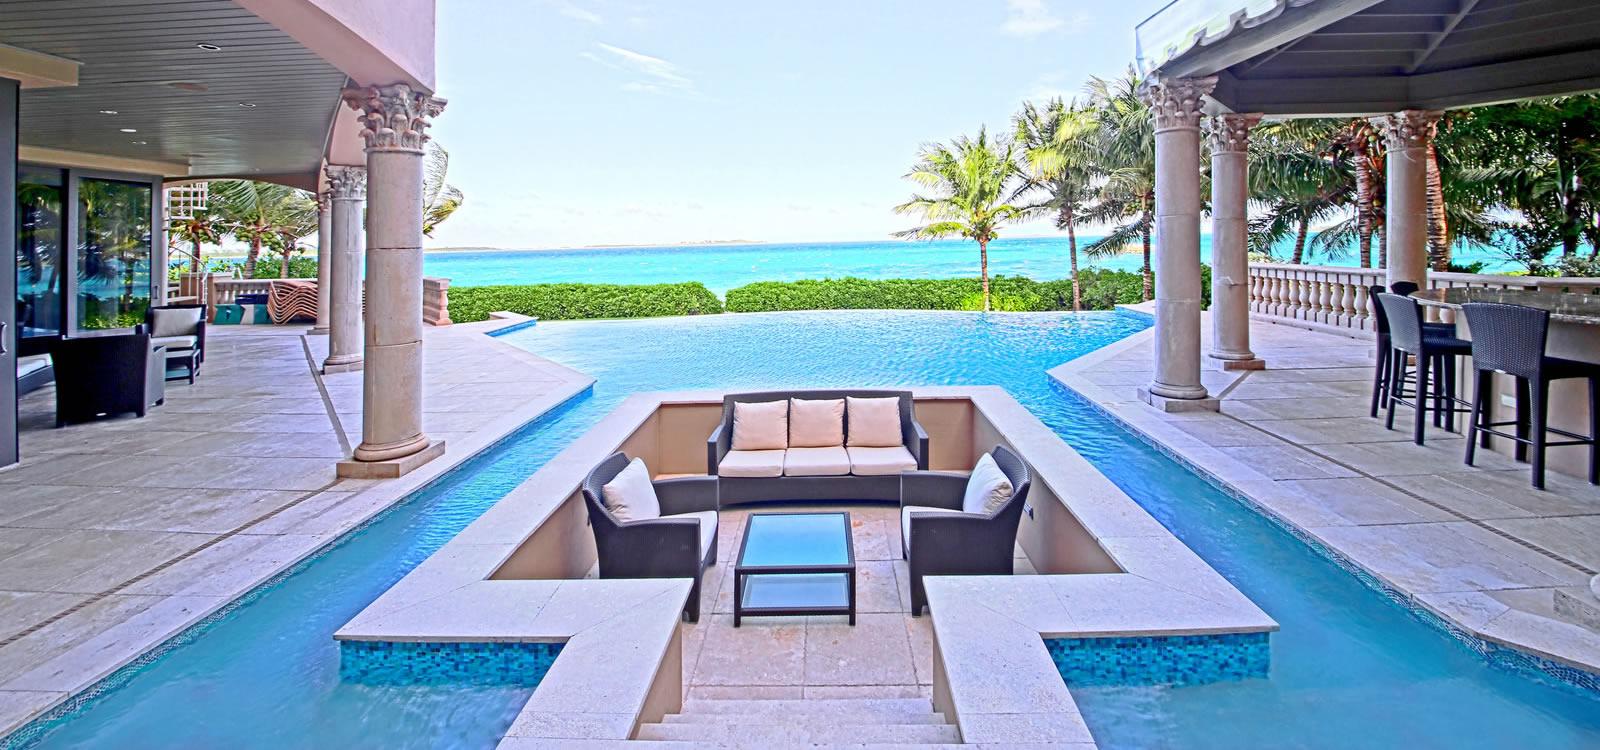 Beachfront Homes For Sale In Virgin Islands